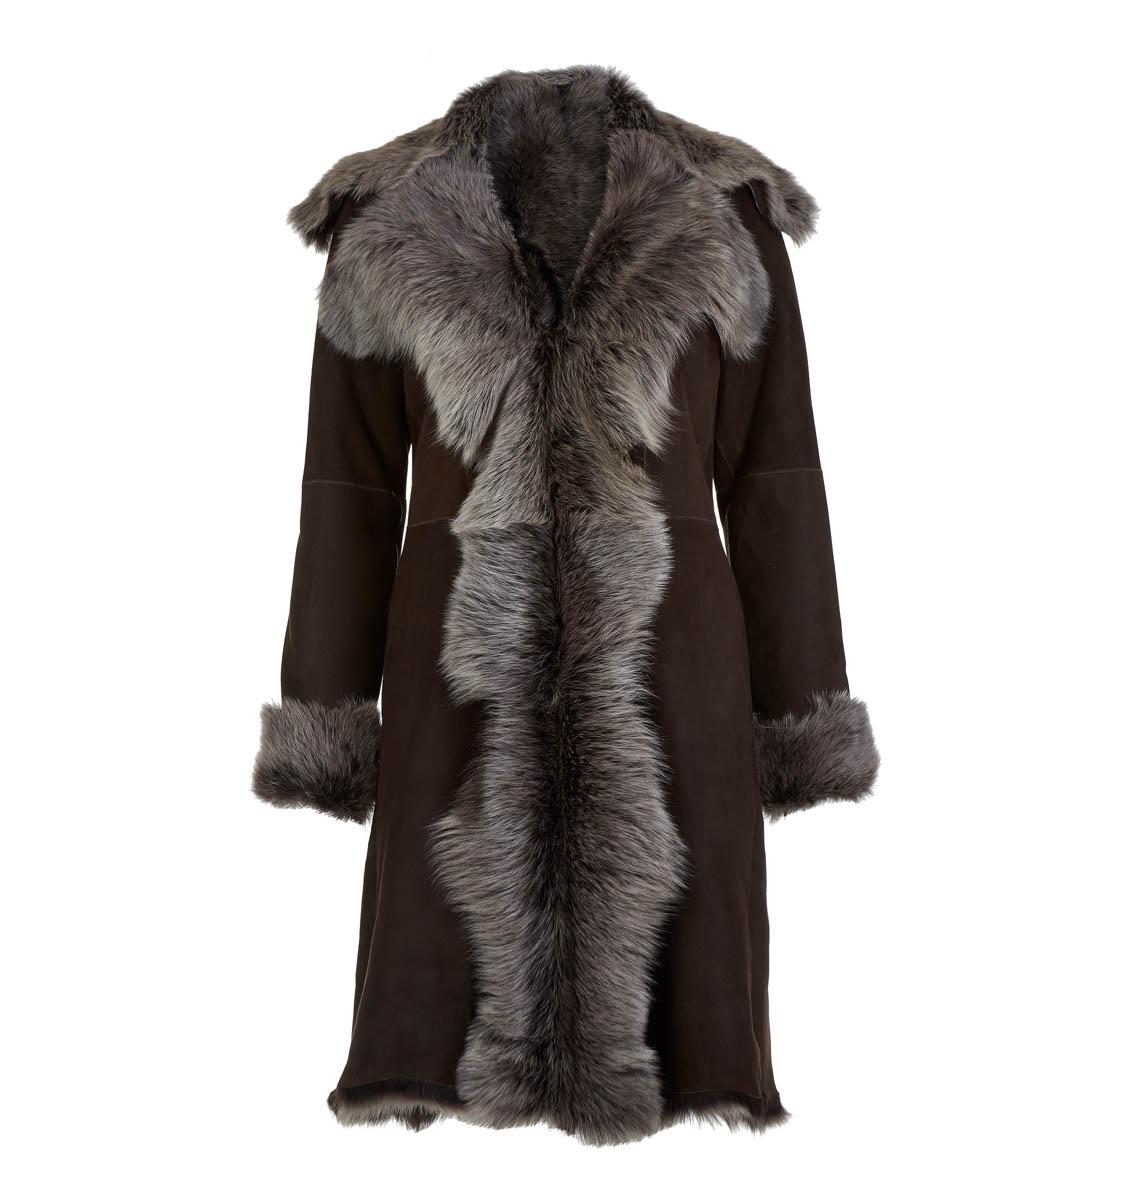 Leather Classics brown long sheepskin coat